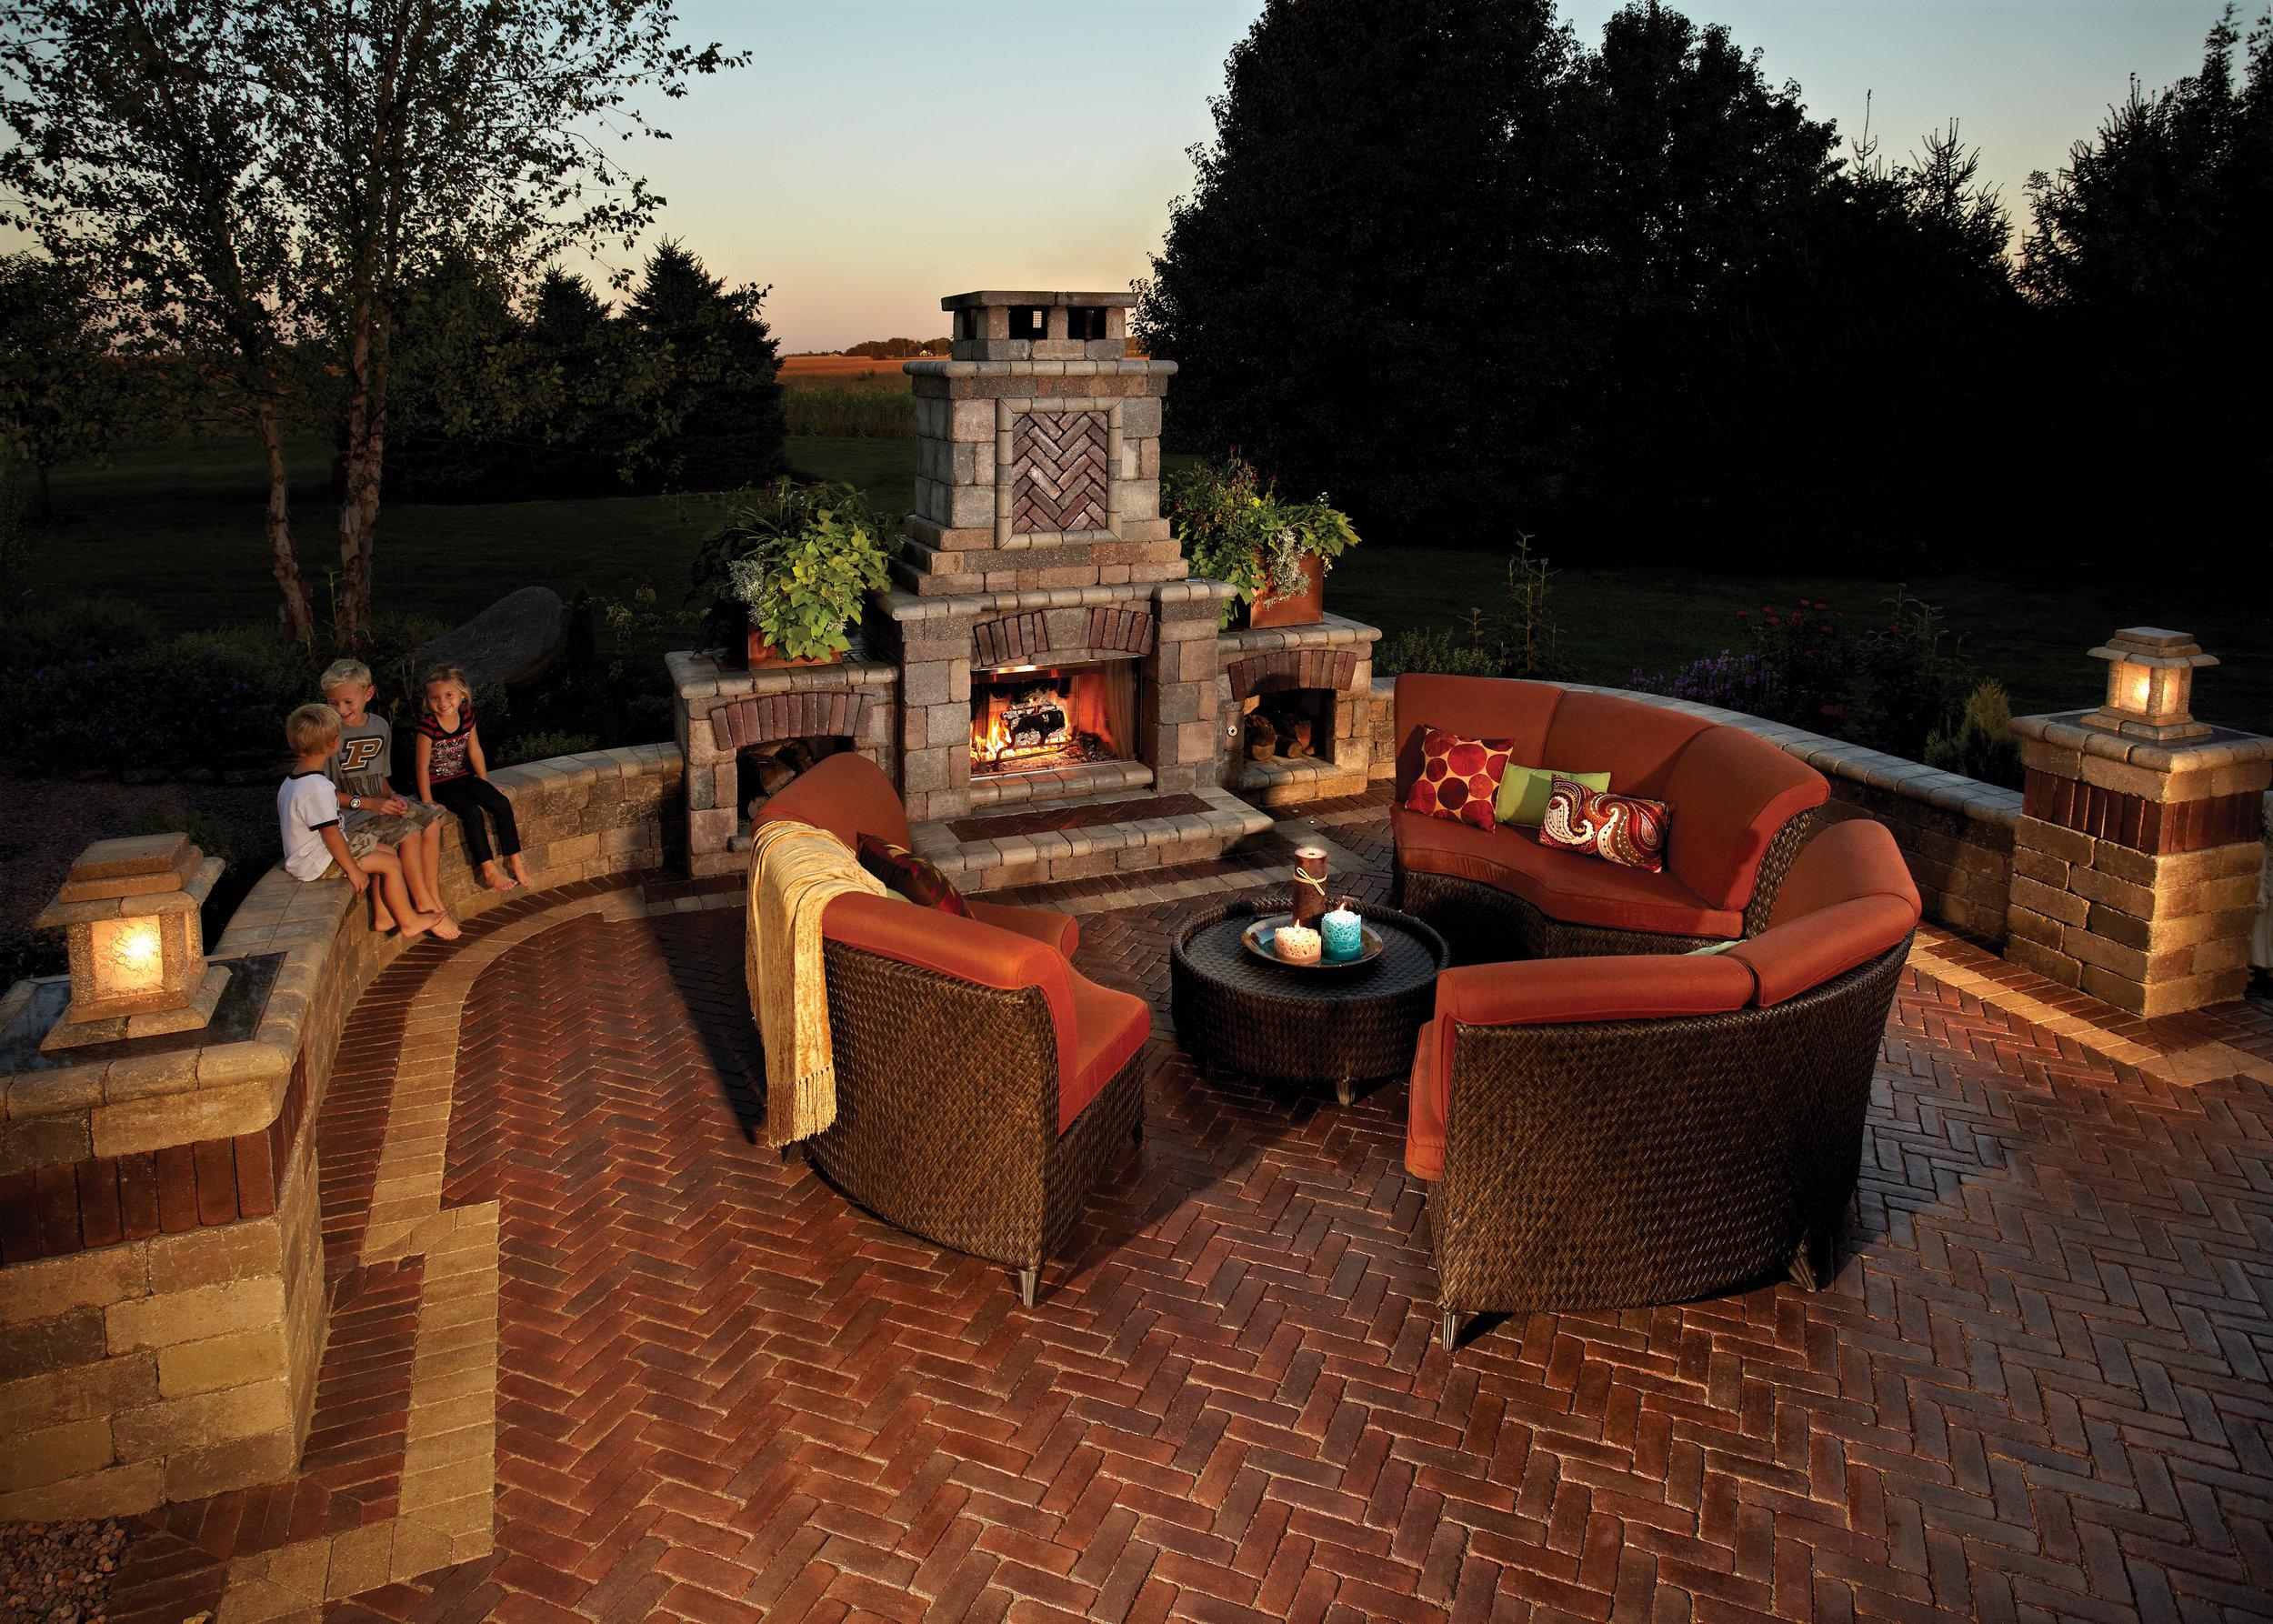 Tips for Deciding on a Design for your Brick Patio in Burr Ridge, IL